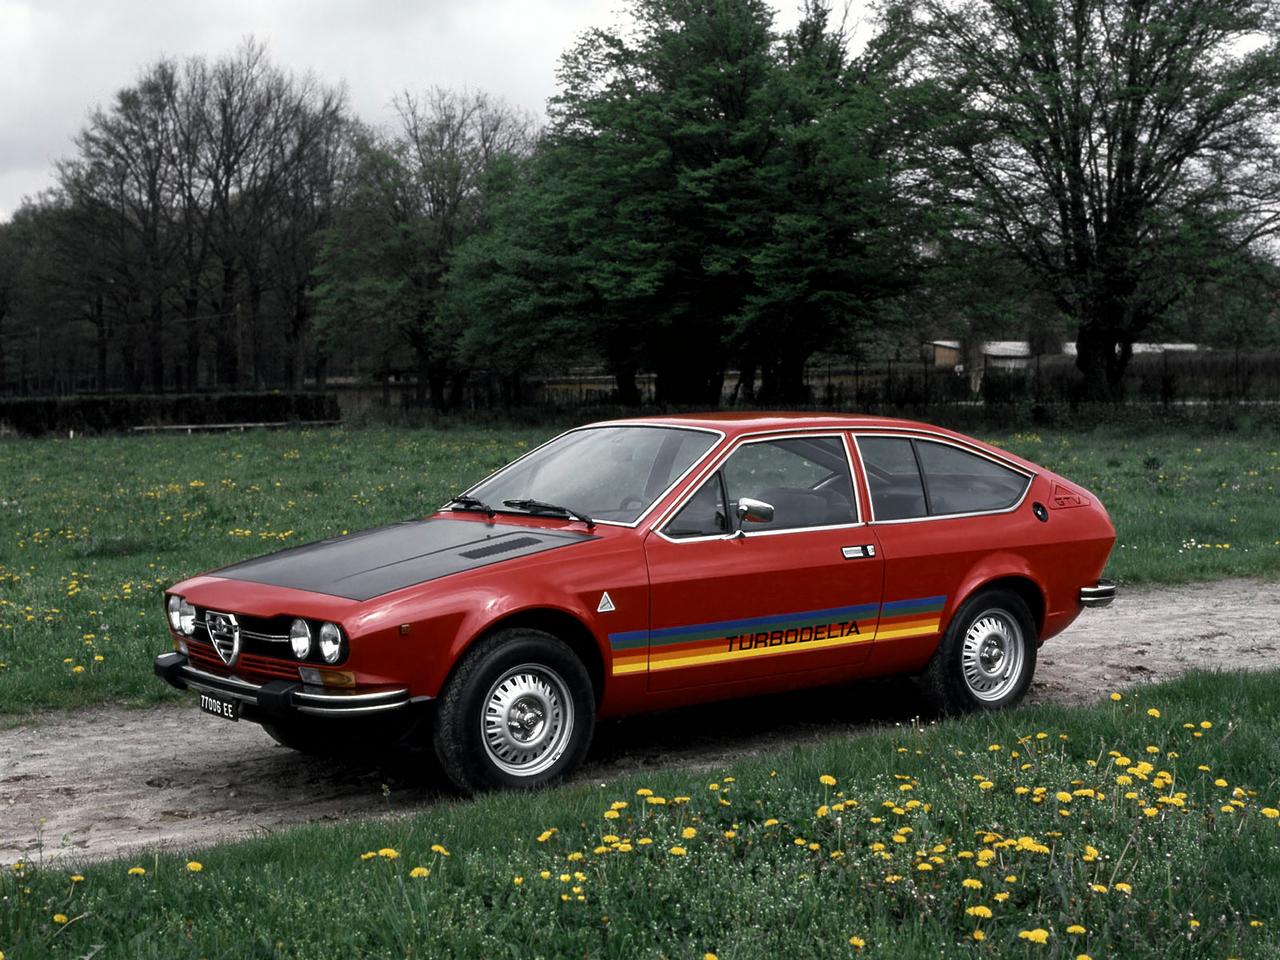 alfa_romeo_giulia_coupé_gtv_0-100-it_2